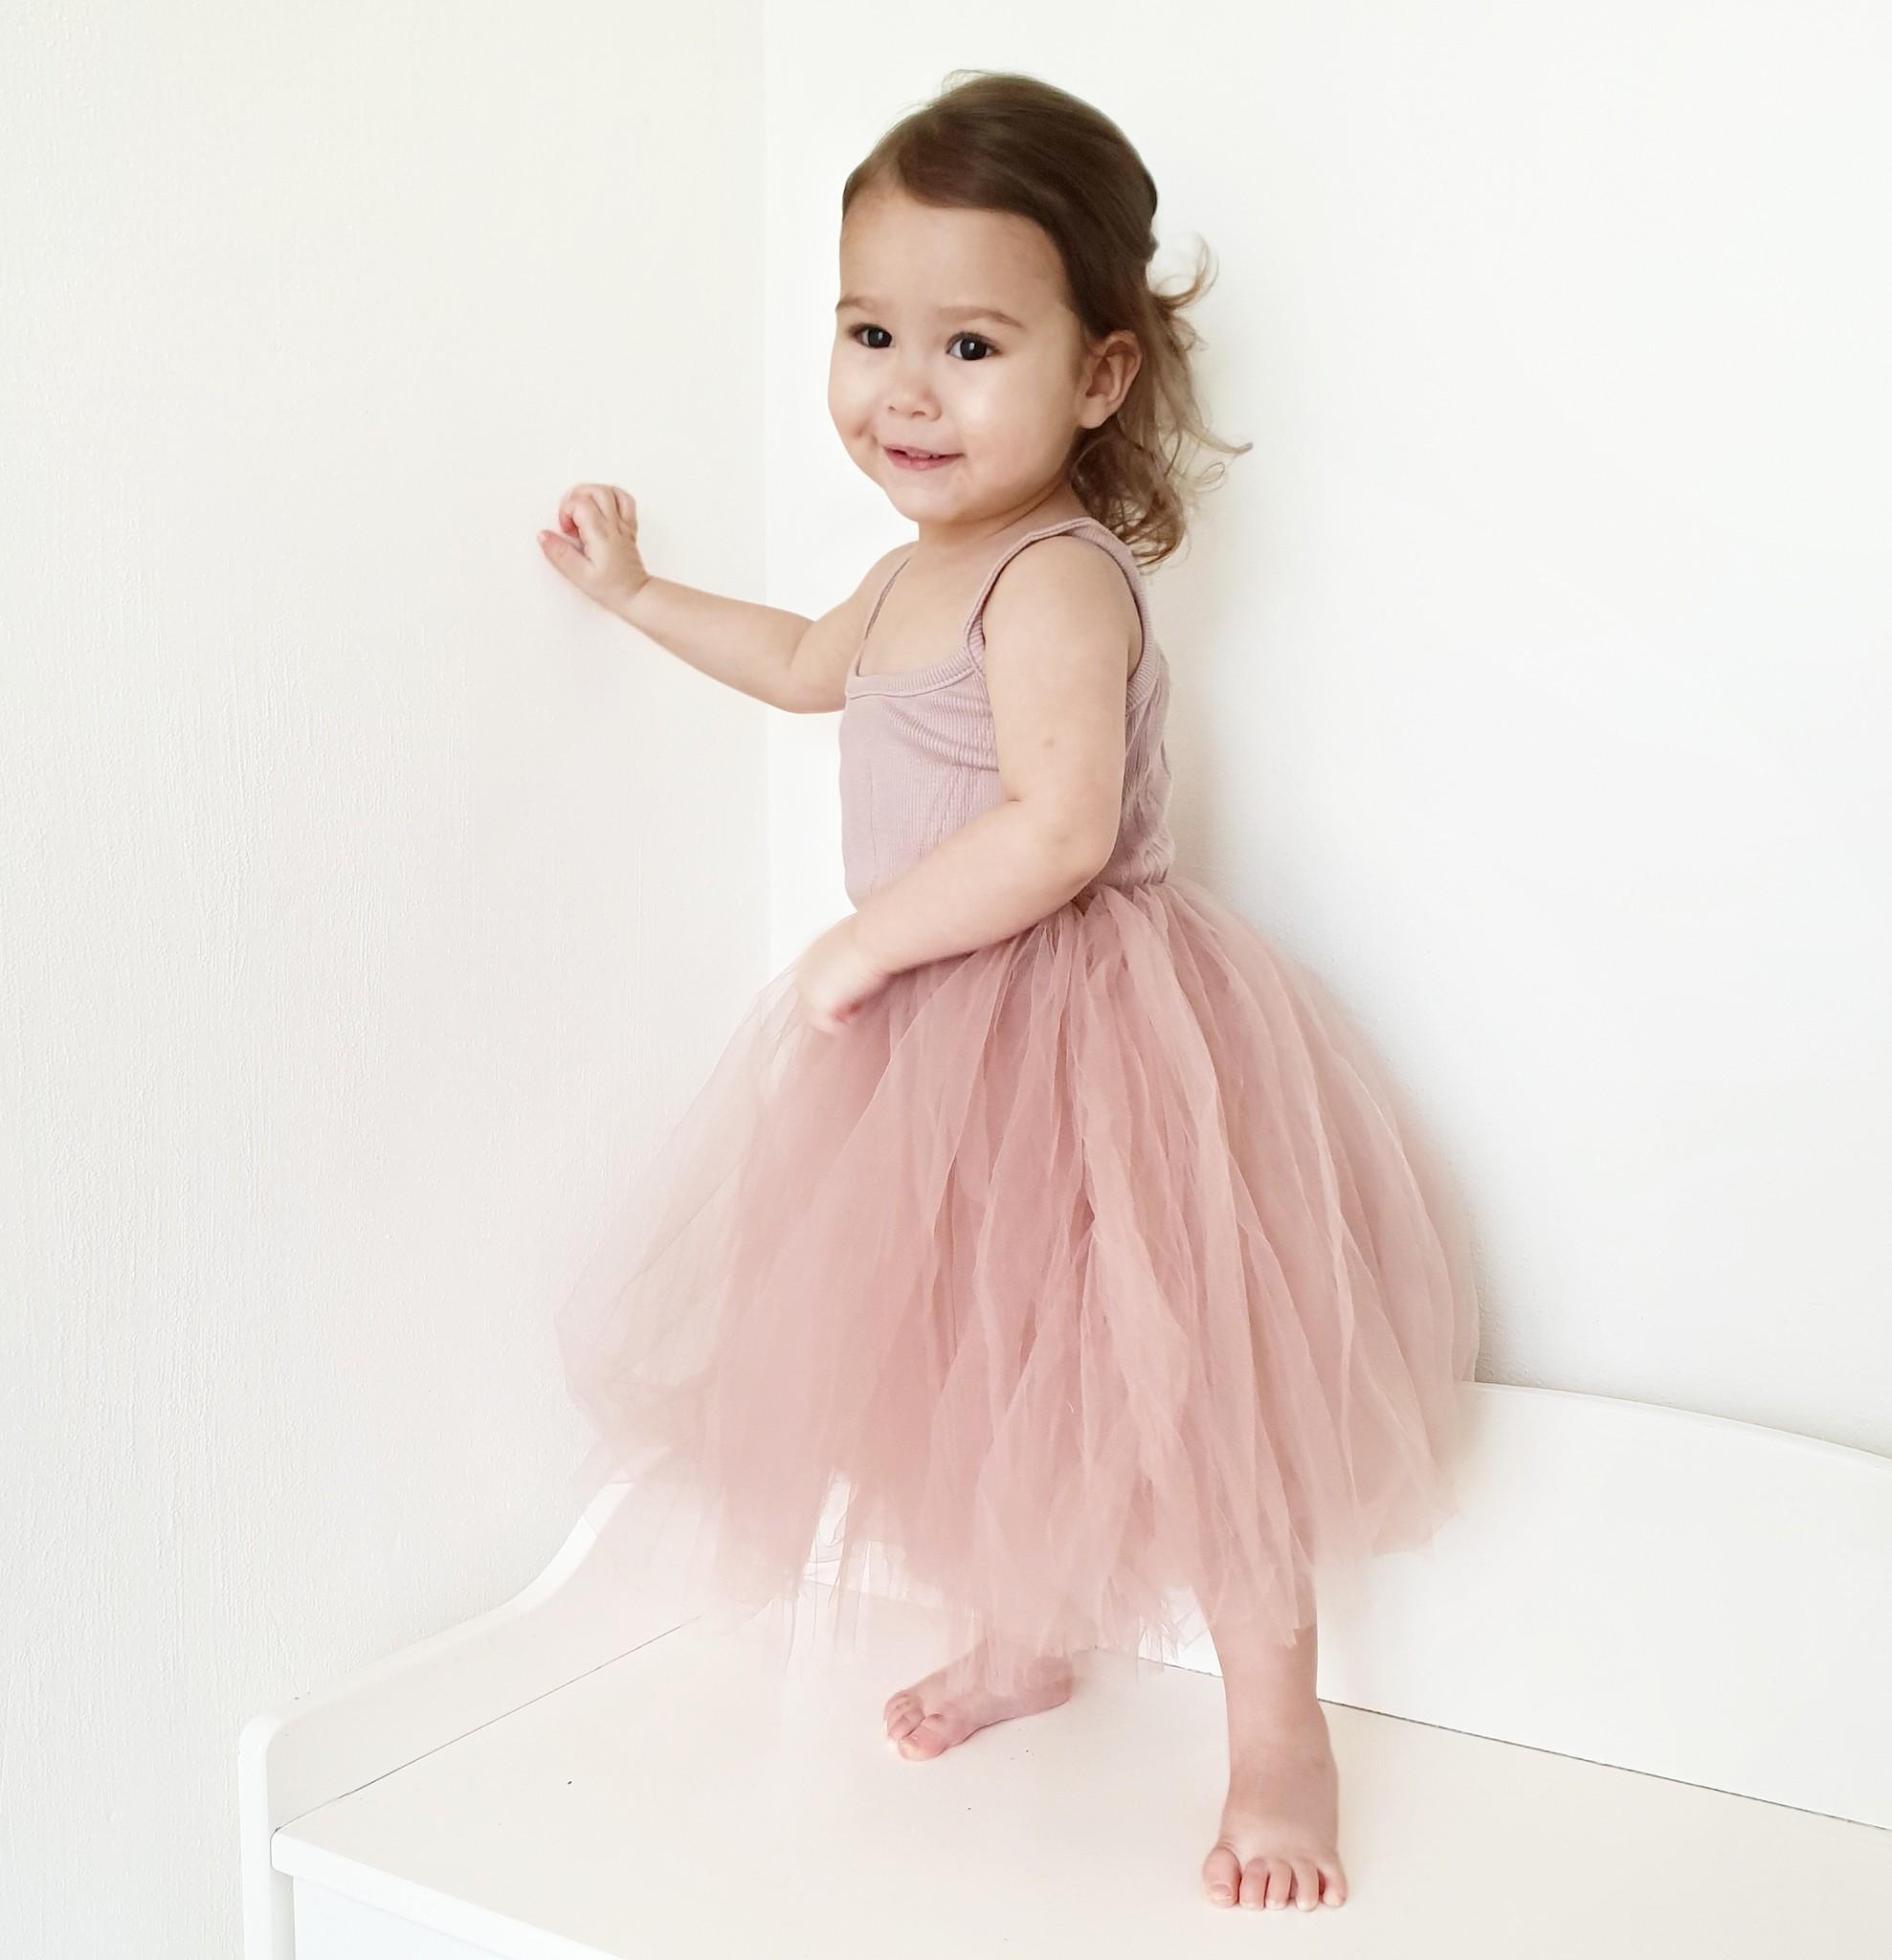 Ma Mer PINK TUTU DRESS WITH RIBBED TOP | MA MER